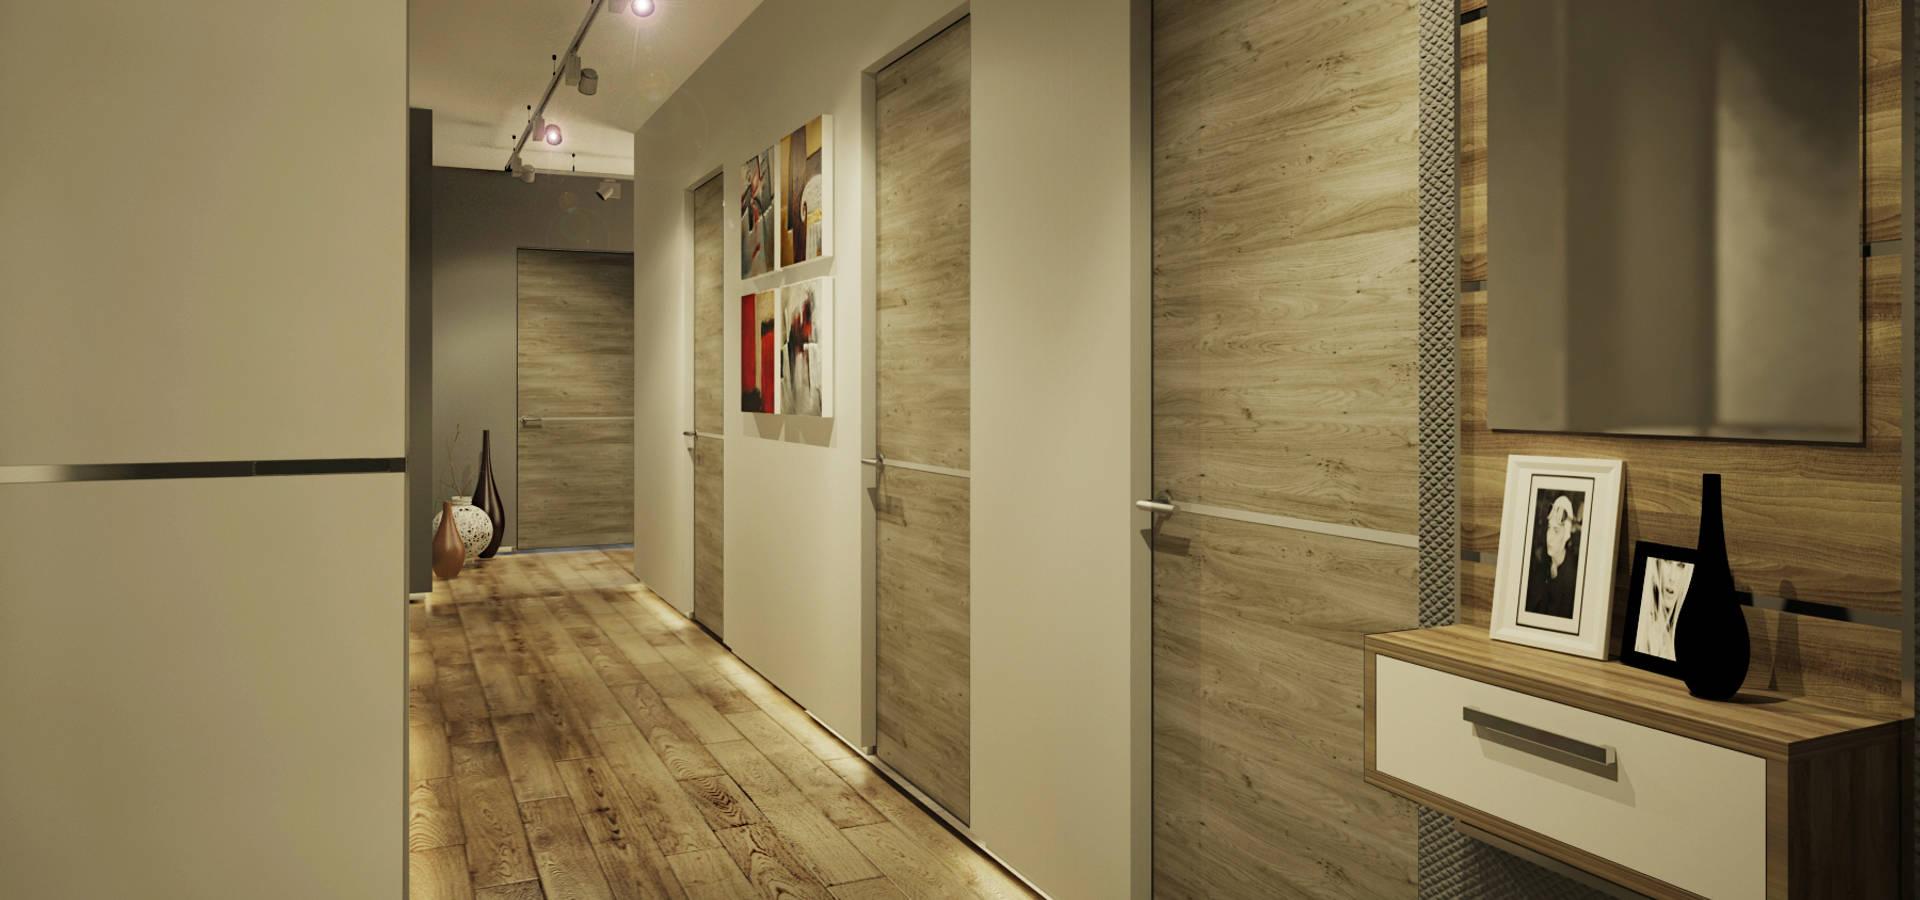 Polovets & Tymoshenko design studio